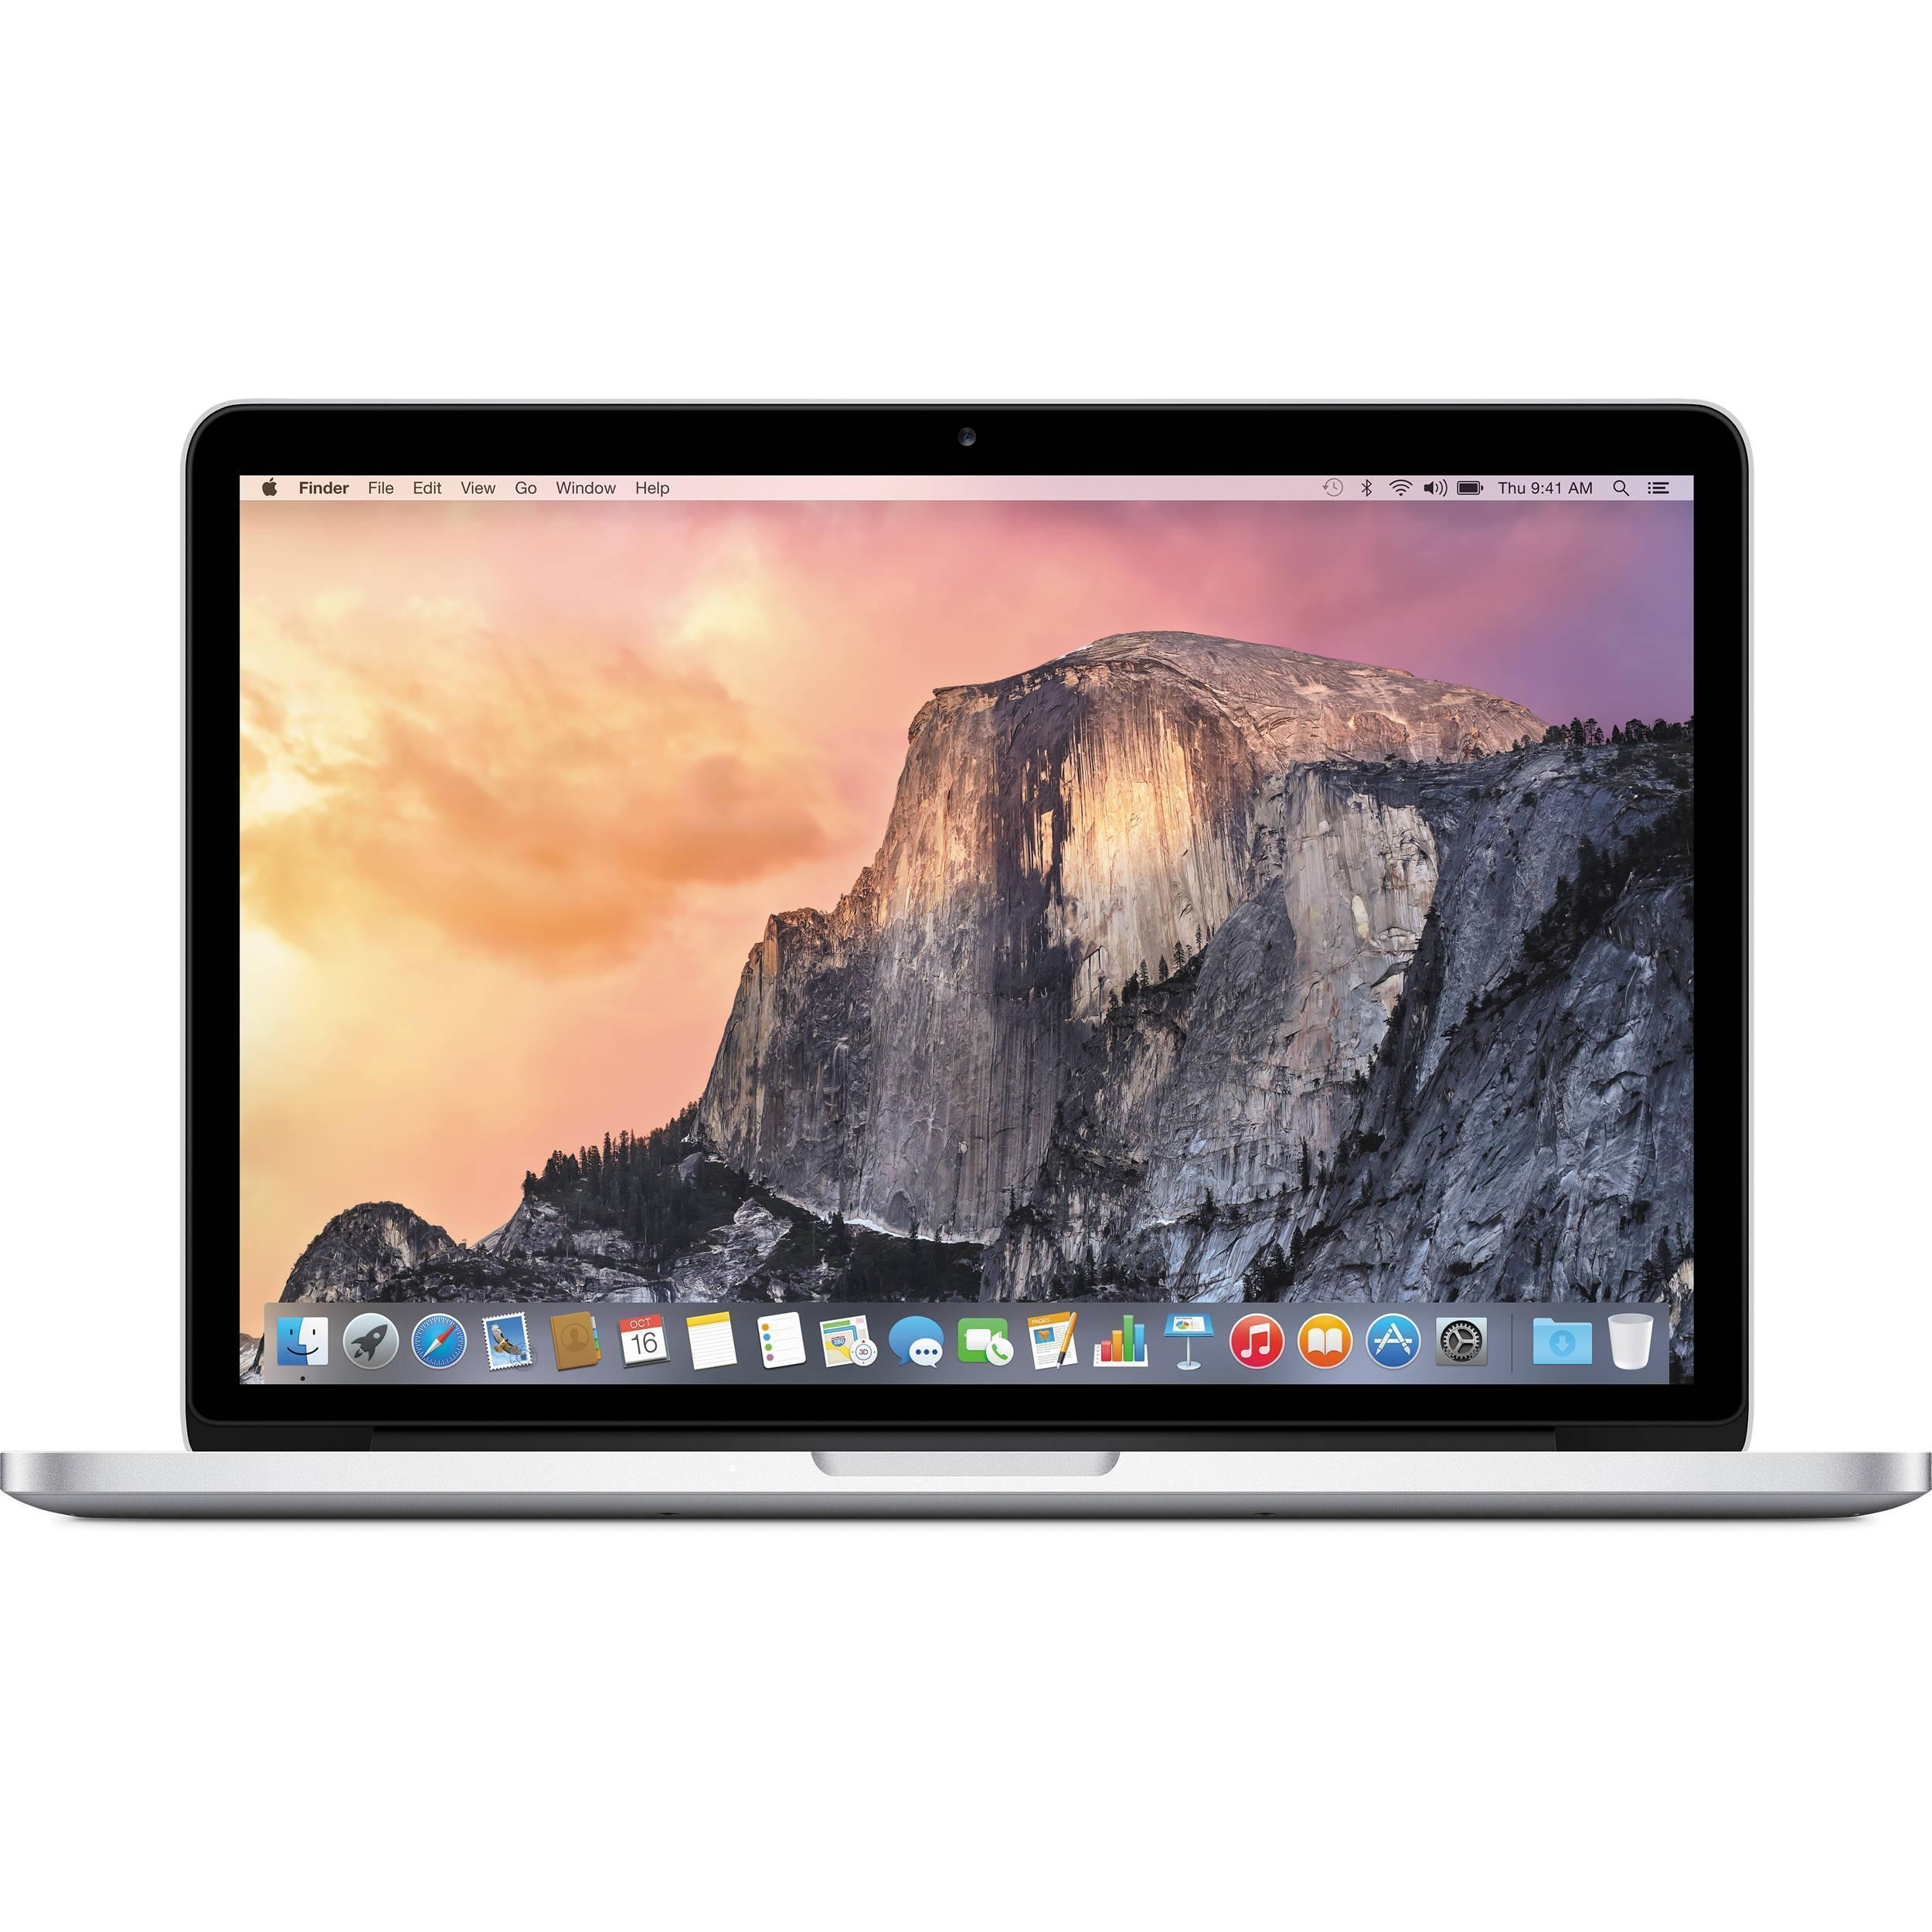 "MacBook Pro 13"" Retina (2012) - Core i5 2,5 GHz - HDD 1 TB - 4GB - AZERTY - Französisch"